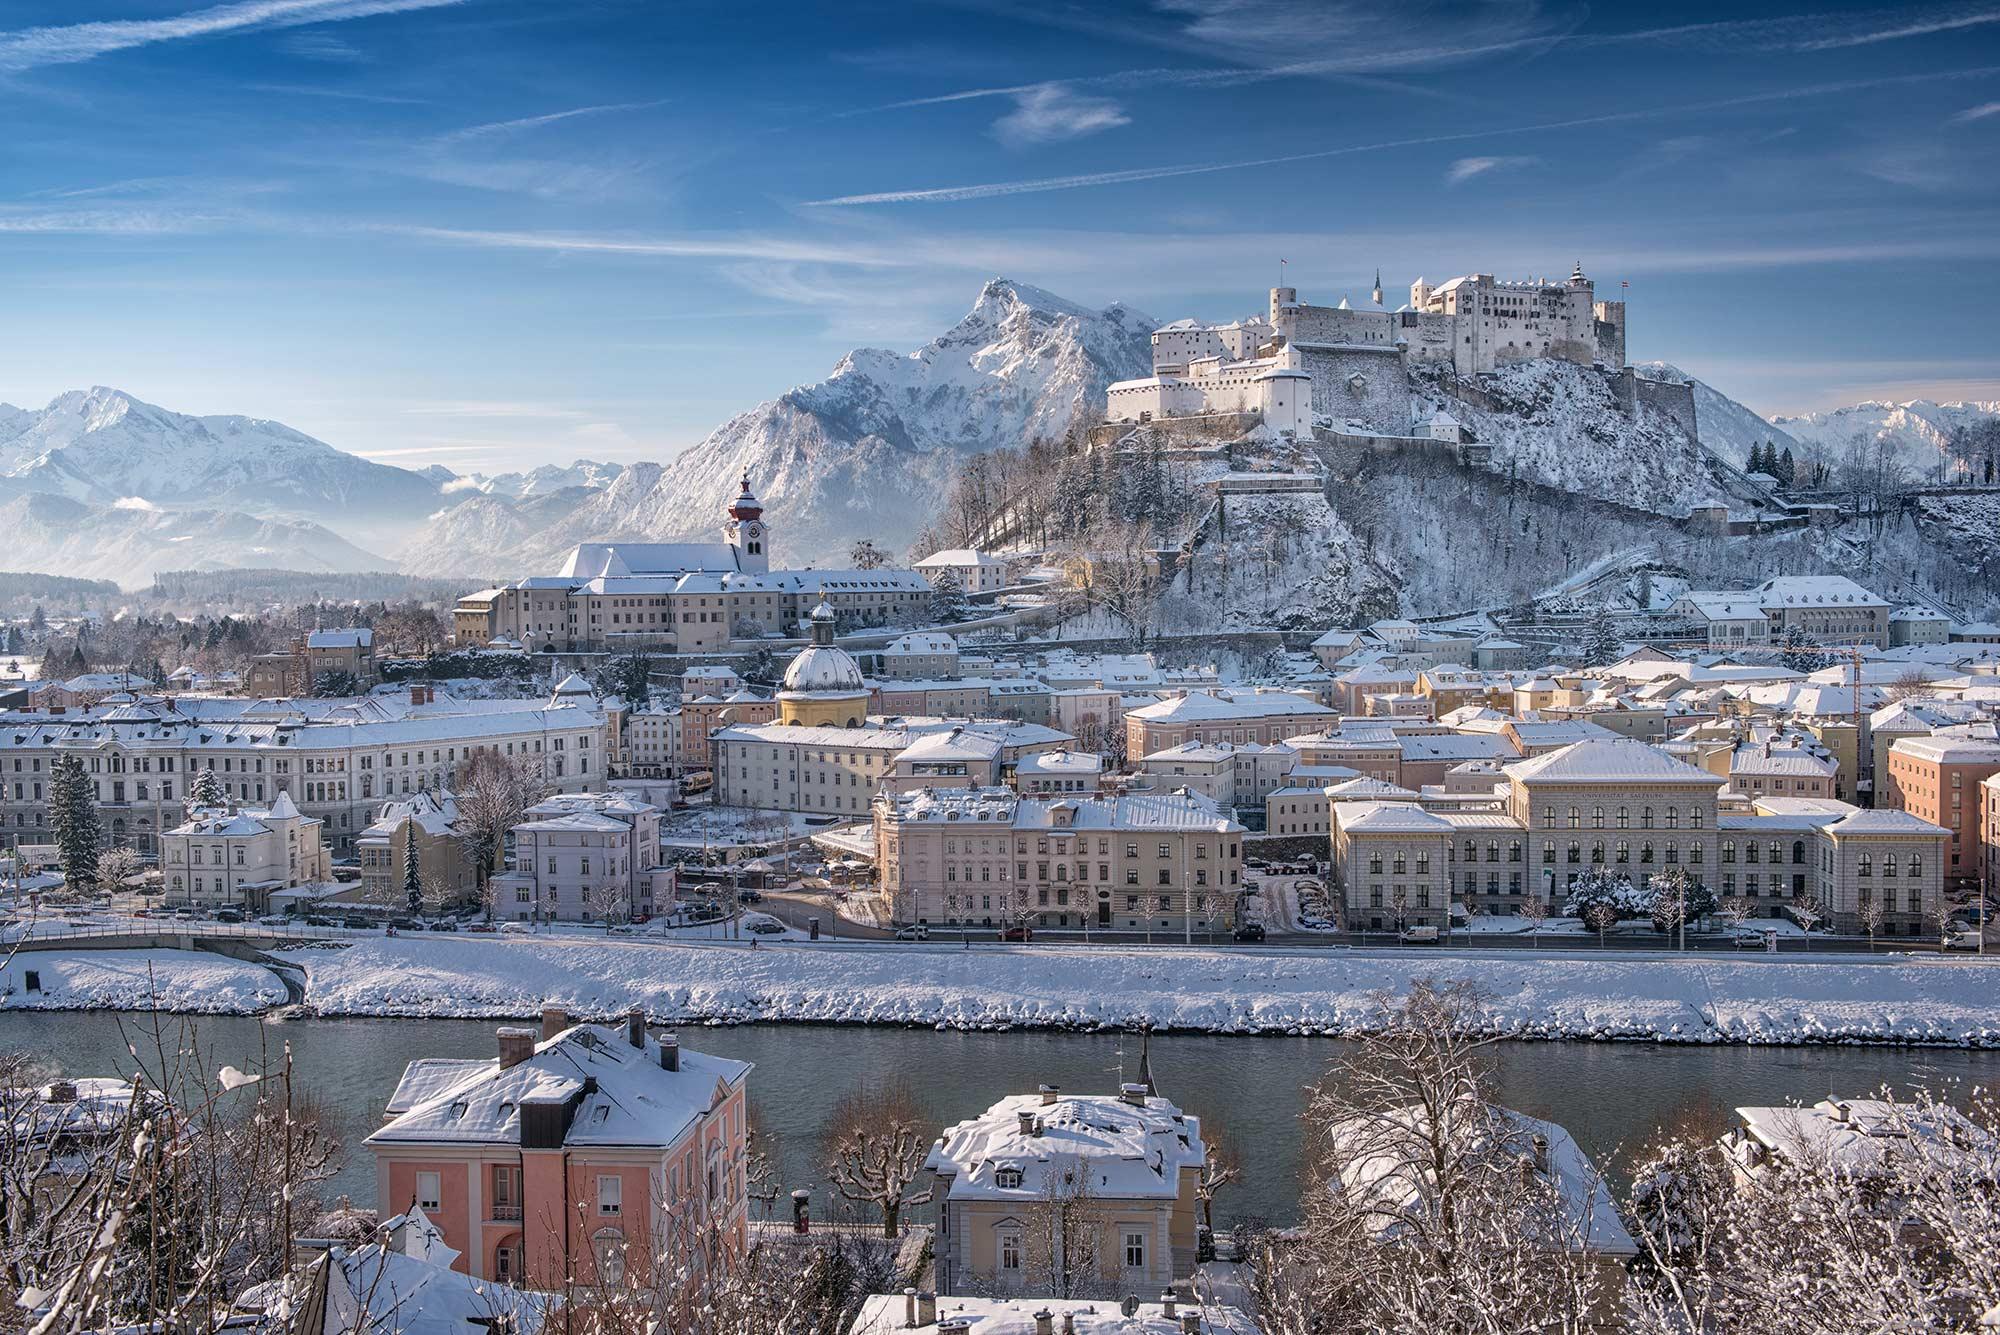 Hohensalzburg Fortress overlooking a wintery Salzburg.